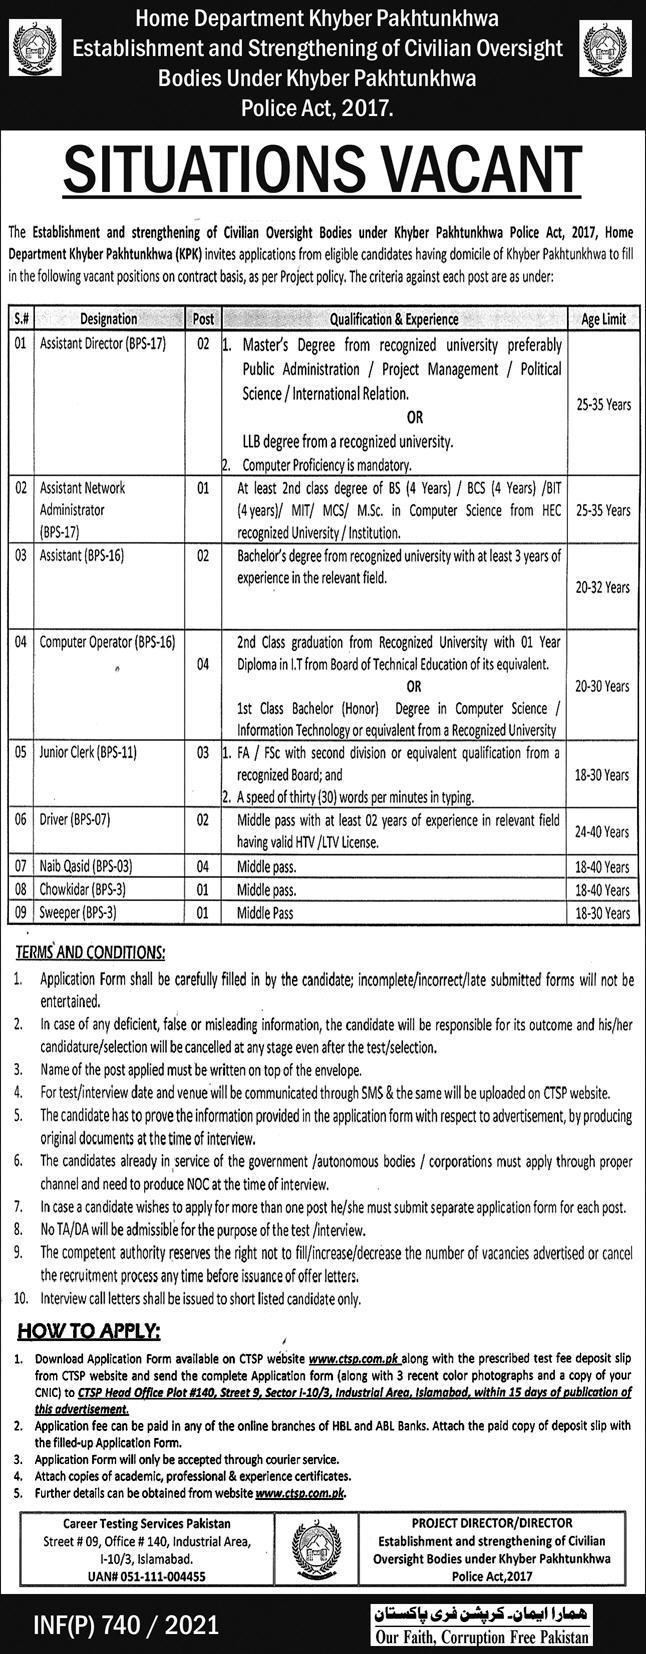 Home Department Jobs 2021 in Peshawar KPK via CTSP